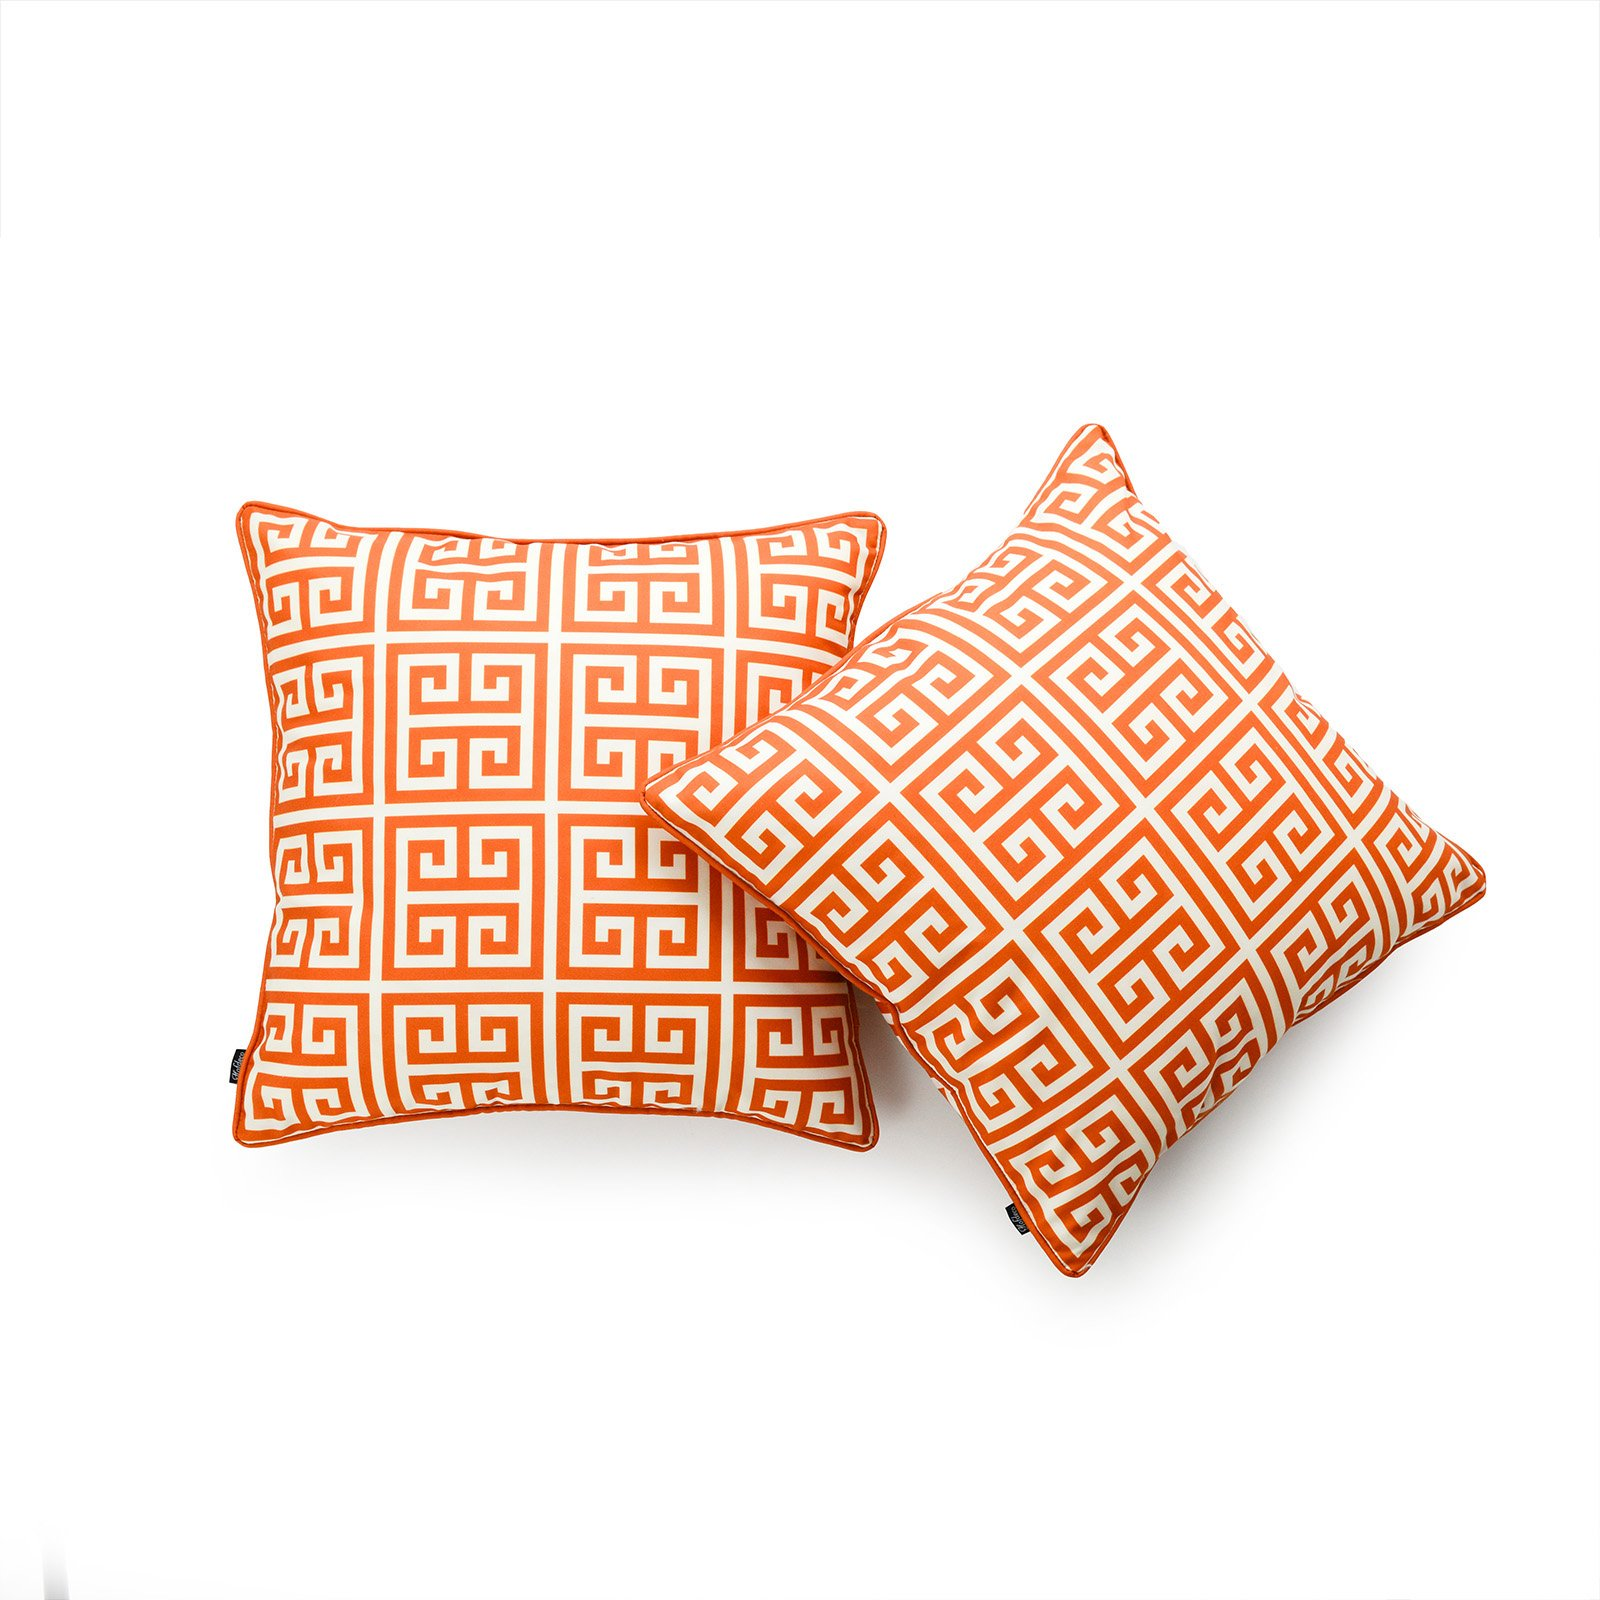 Hofdeco Decorative Throw Pillow Cover INDOOR OUTDOOR WATER RESISTANT Canvas Maple Orange Greek Key 18''x18'' Set of 2